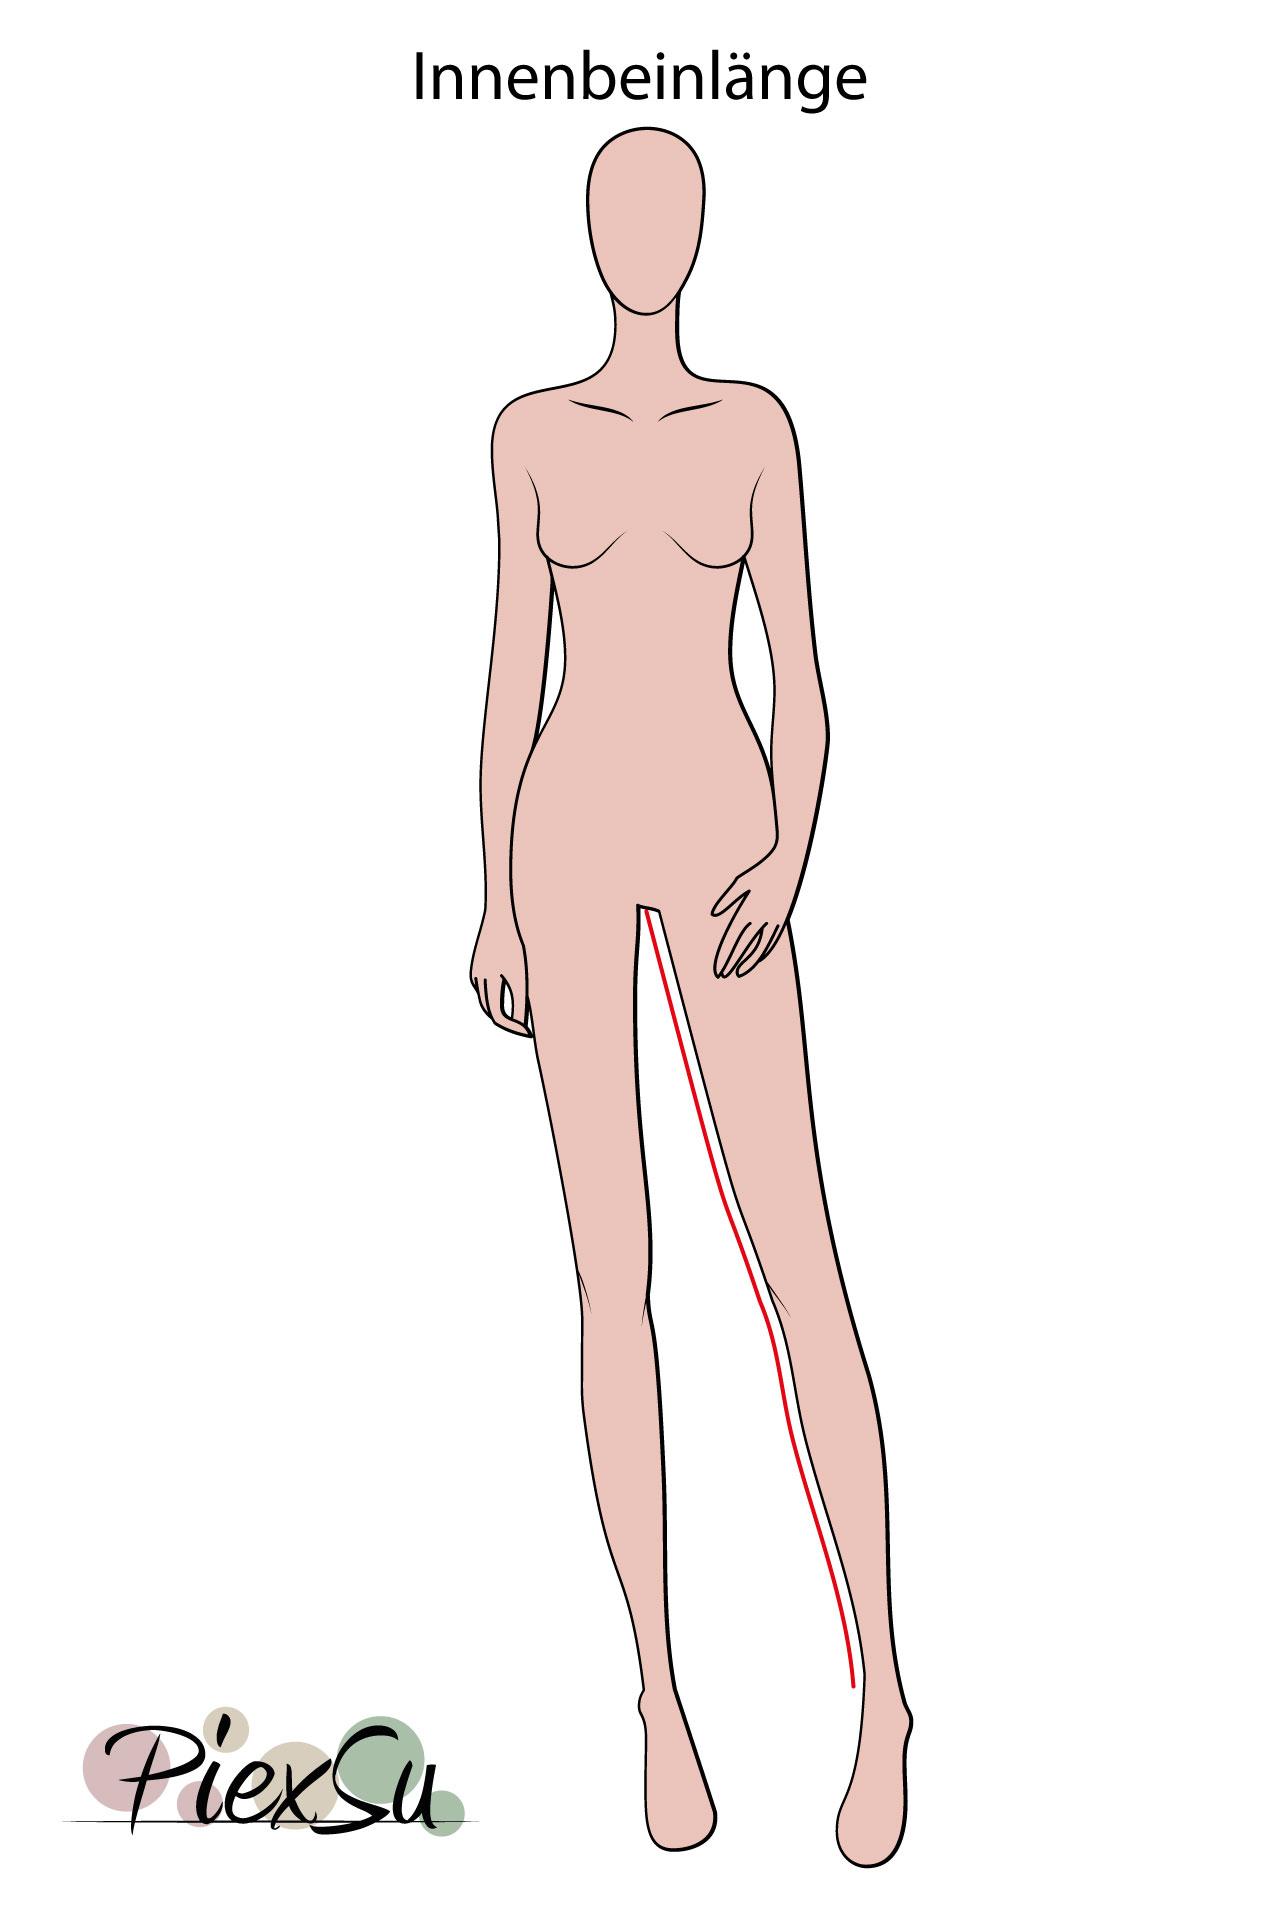 PiexSu-richtig-Maßnehmen-Maße-Schnittmuster-nähen-Schnittmuster-anpassen-messen-Maßband-Innenbeinlänge